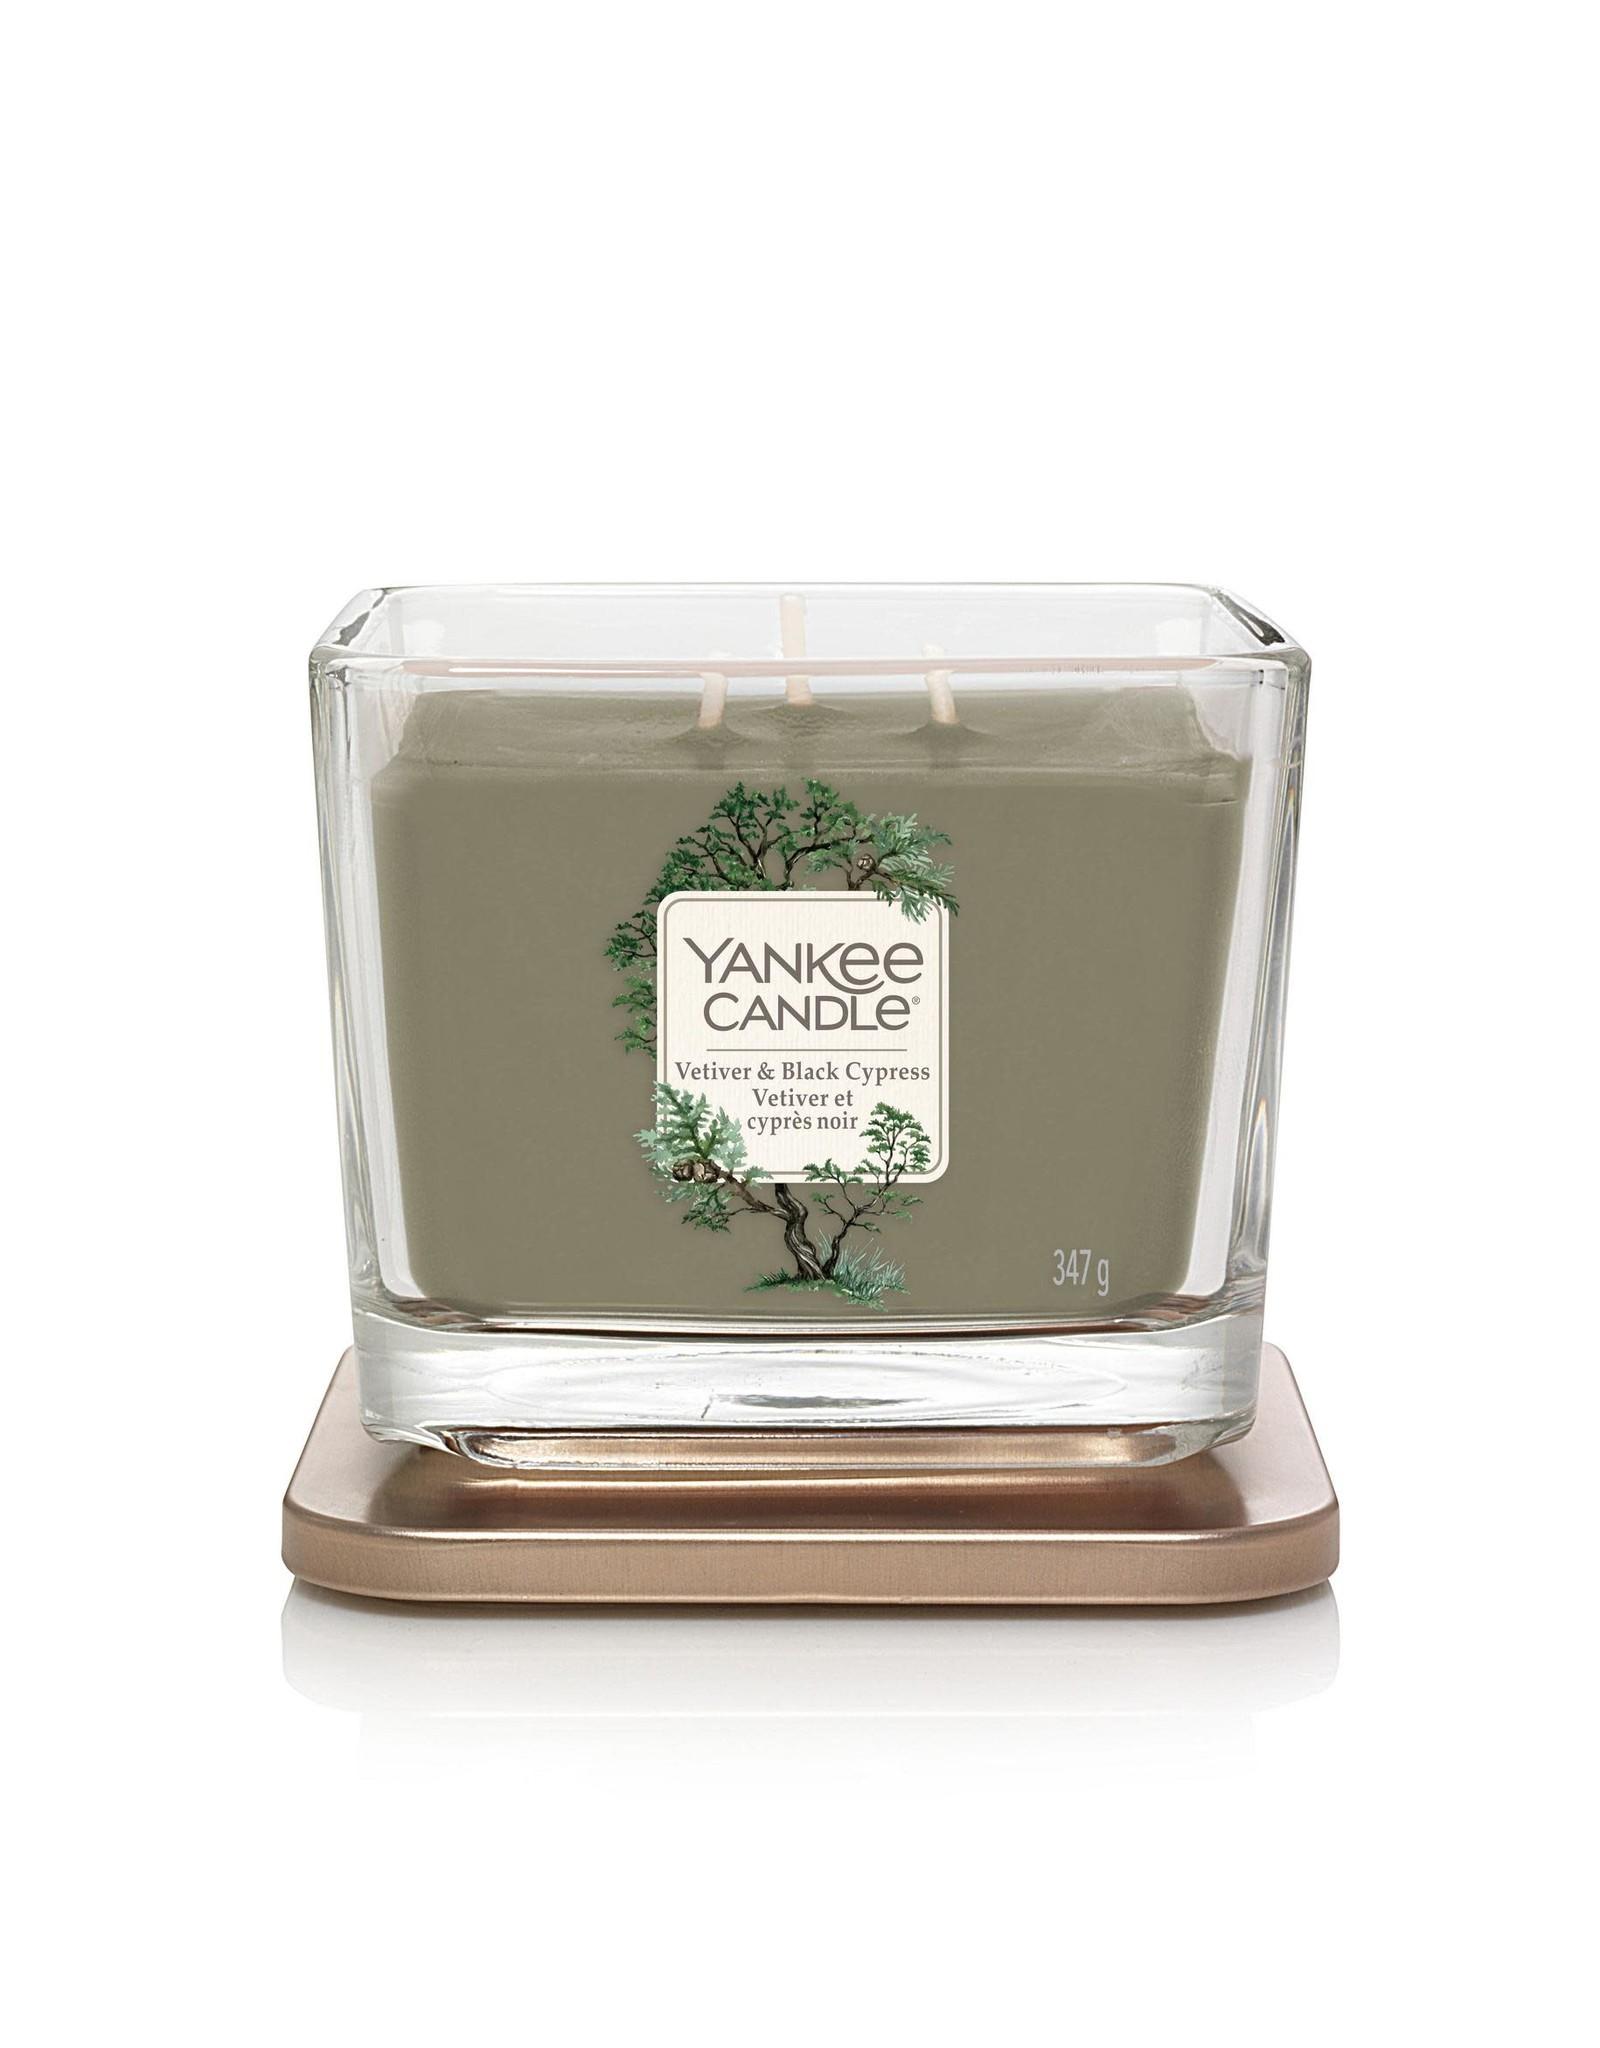 Yankee Candle Vetiver & Black Cypress - Medium Vessel